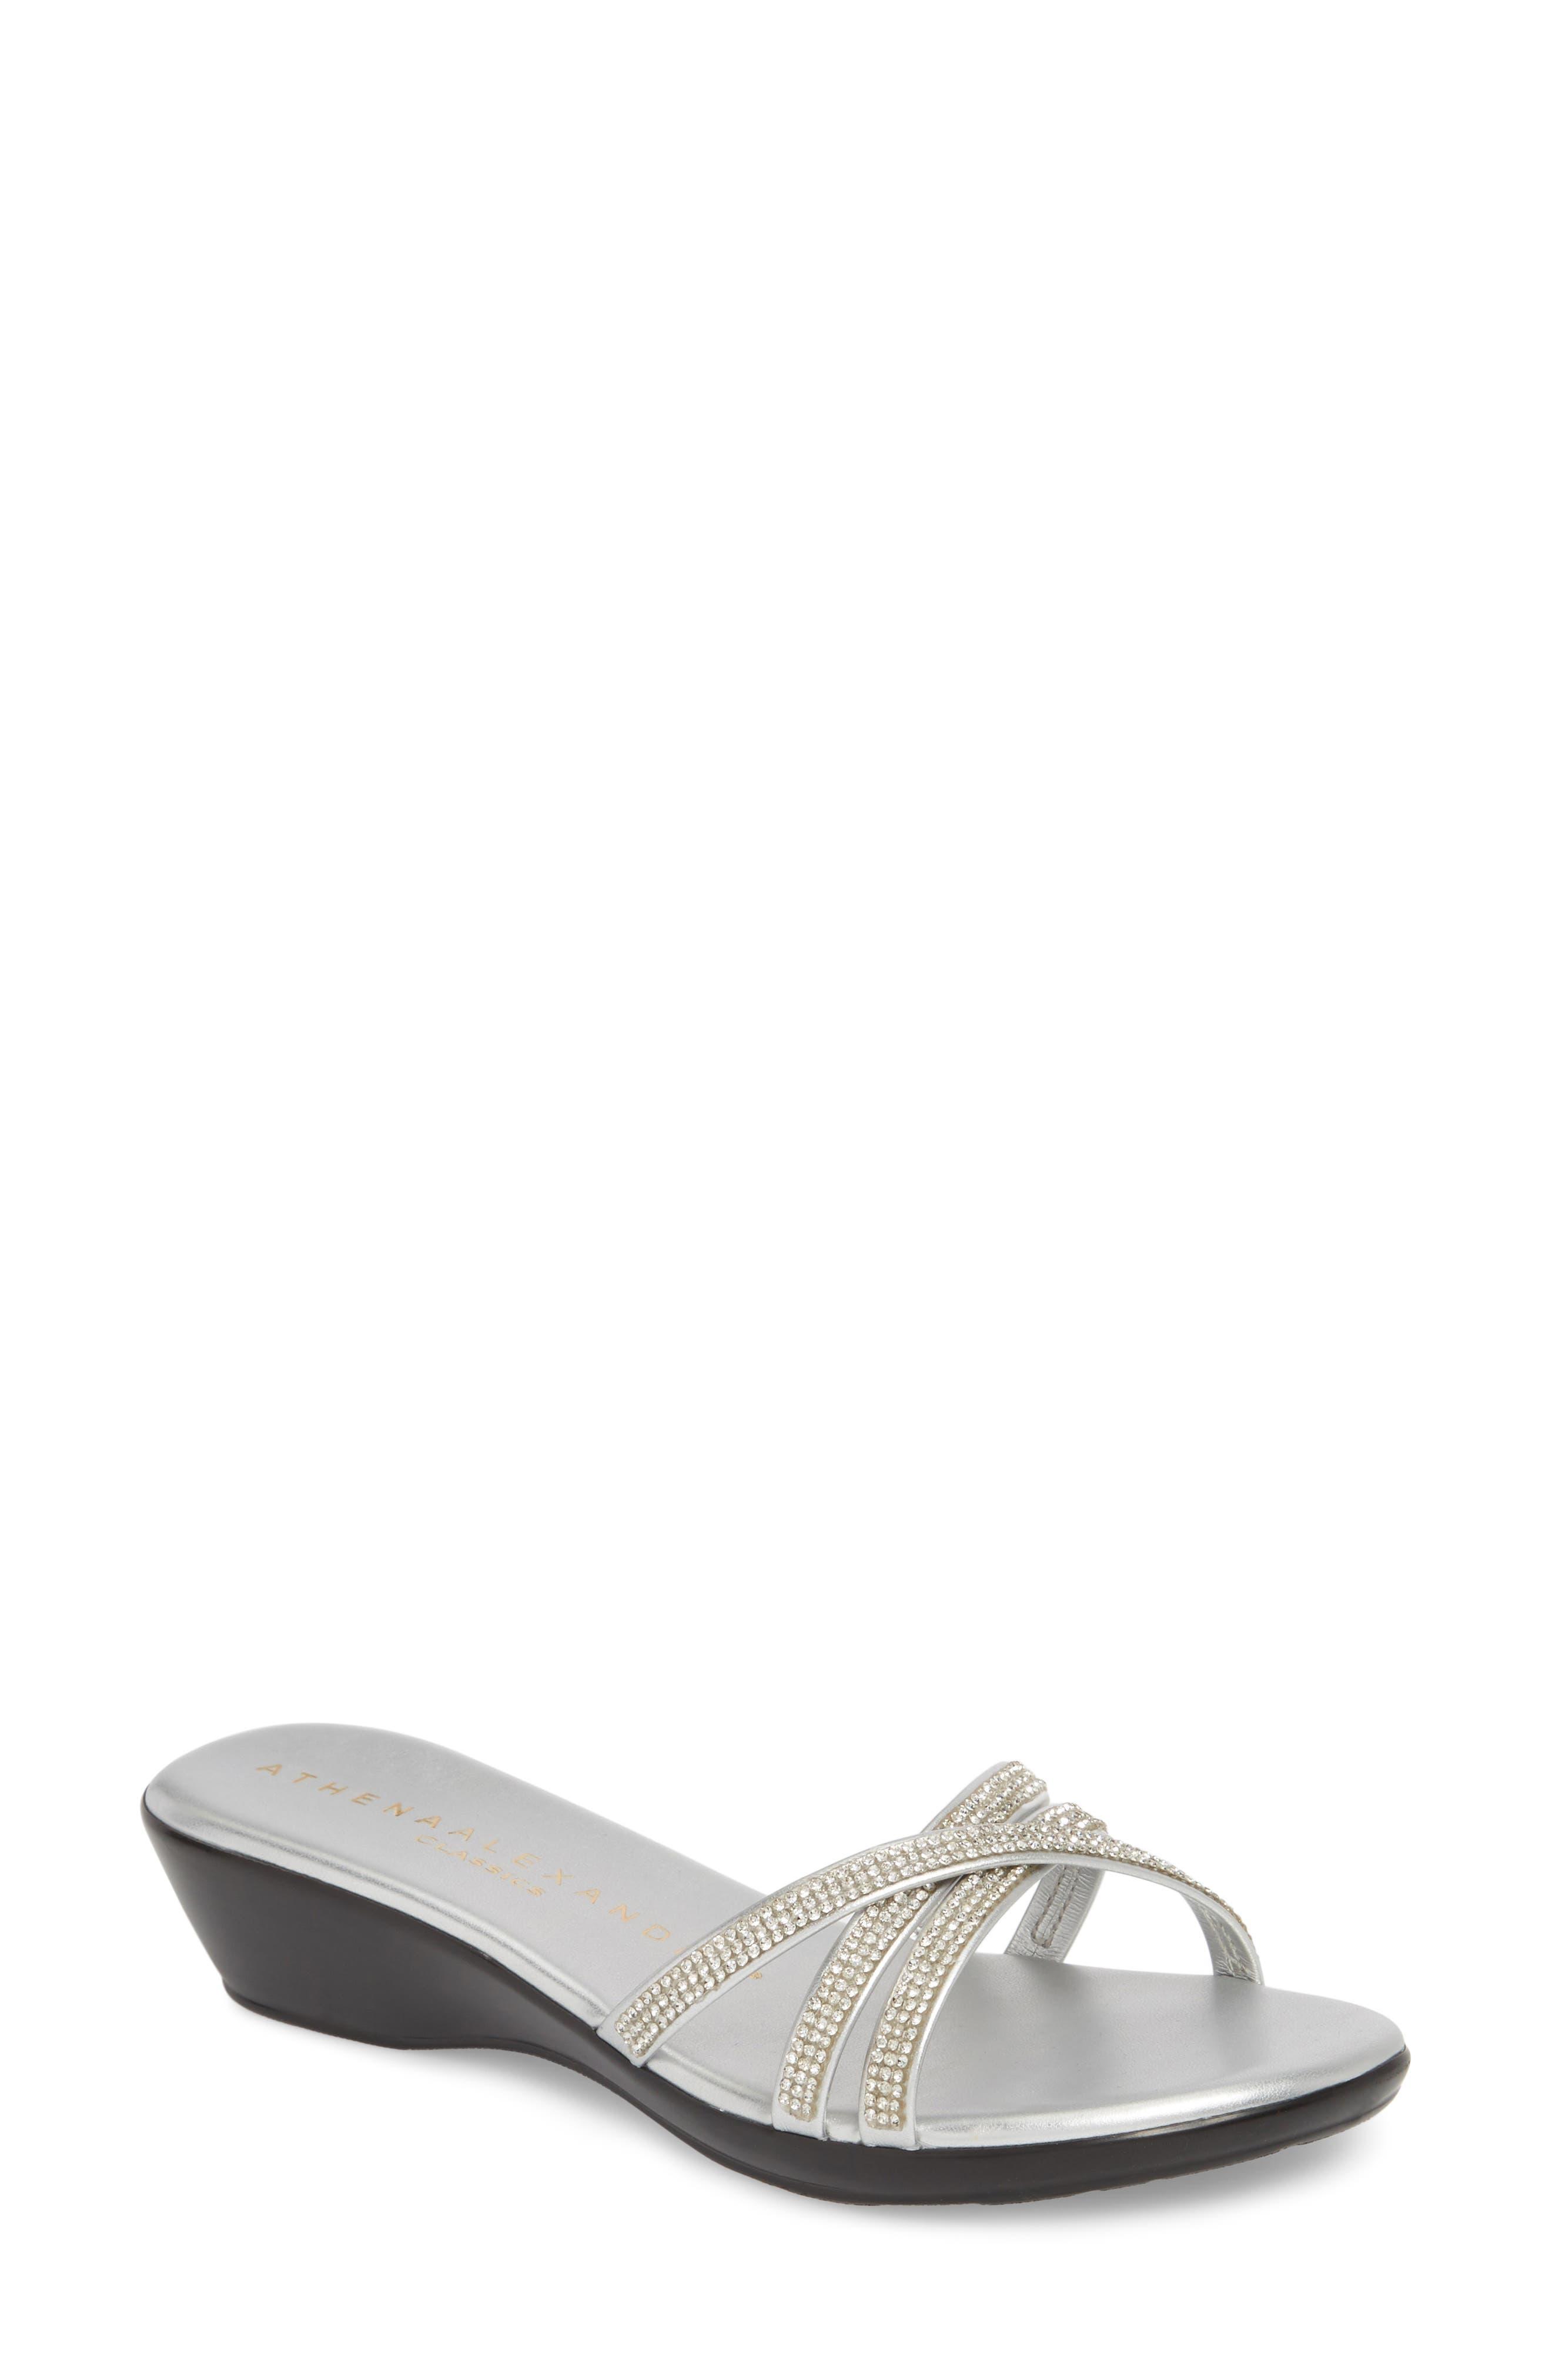 Athena Alexander Harlow Slide Sandal, Metallic